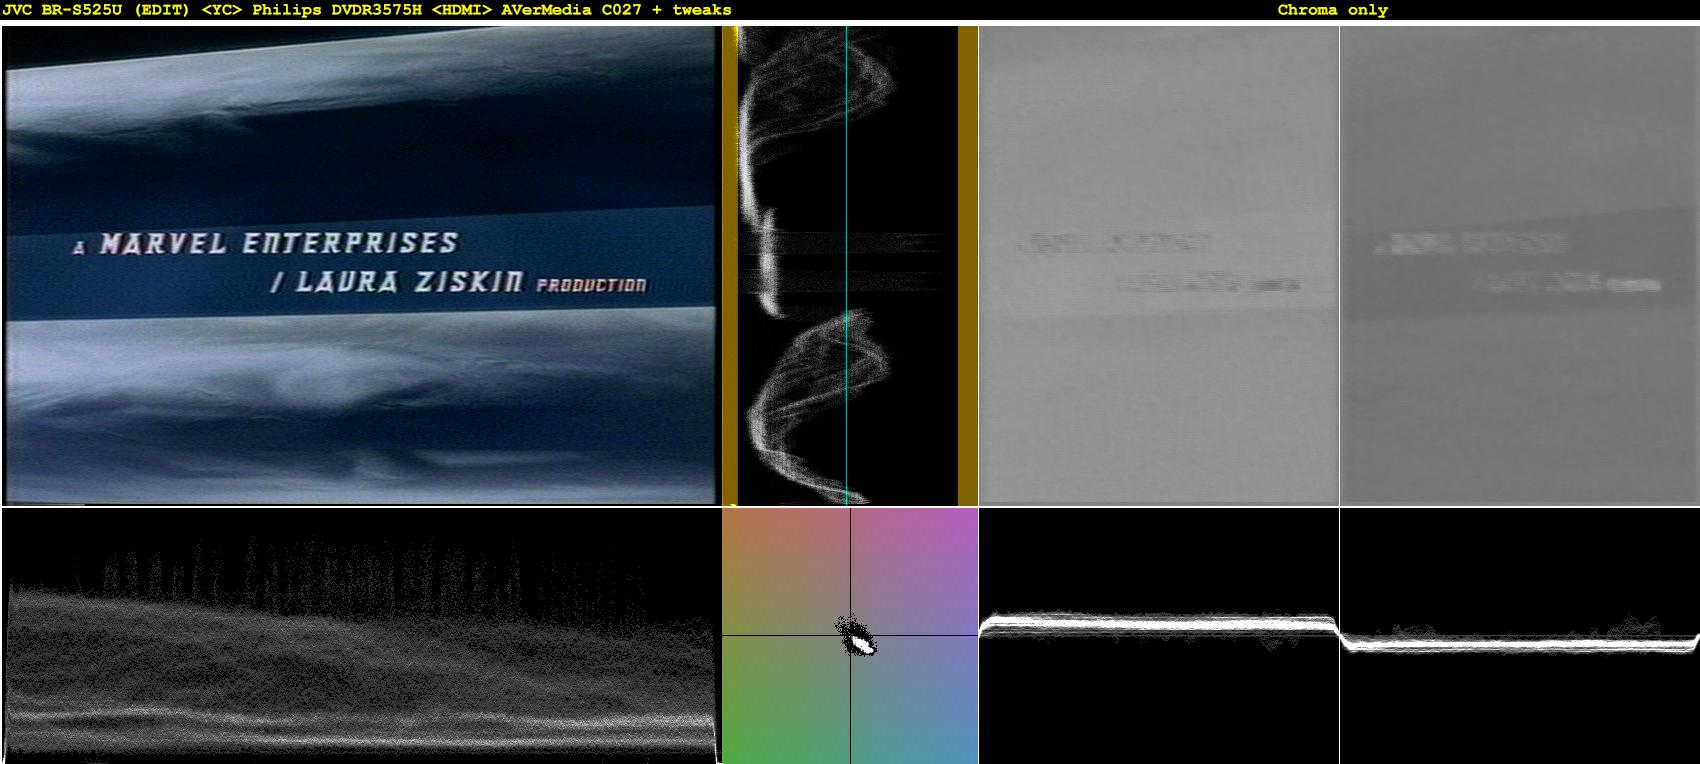 Click image for larger version  Name:0-09-01 - JVC BR-S525U (EDIT).png Views:1224 Size:931.4 KB ID:37665